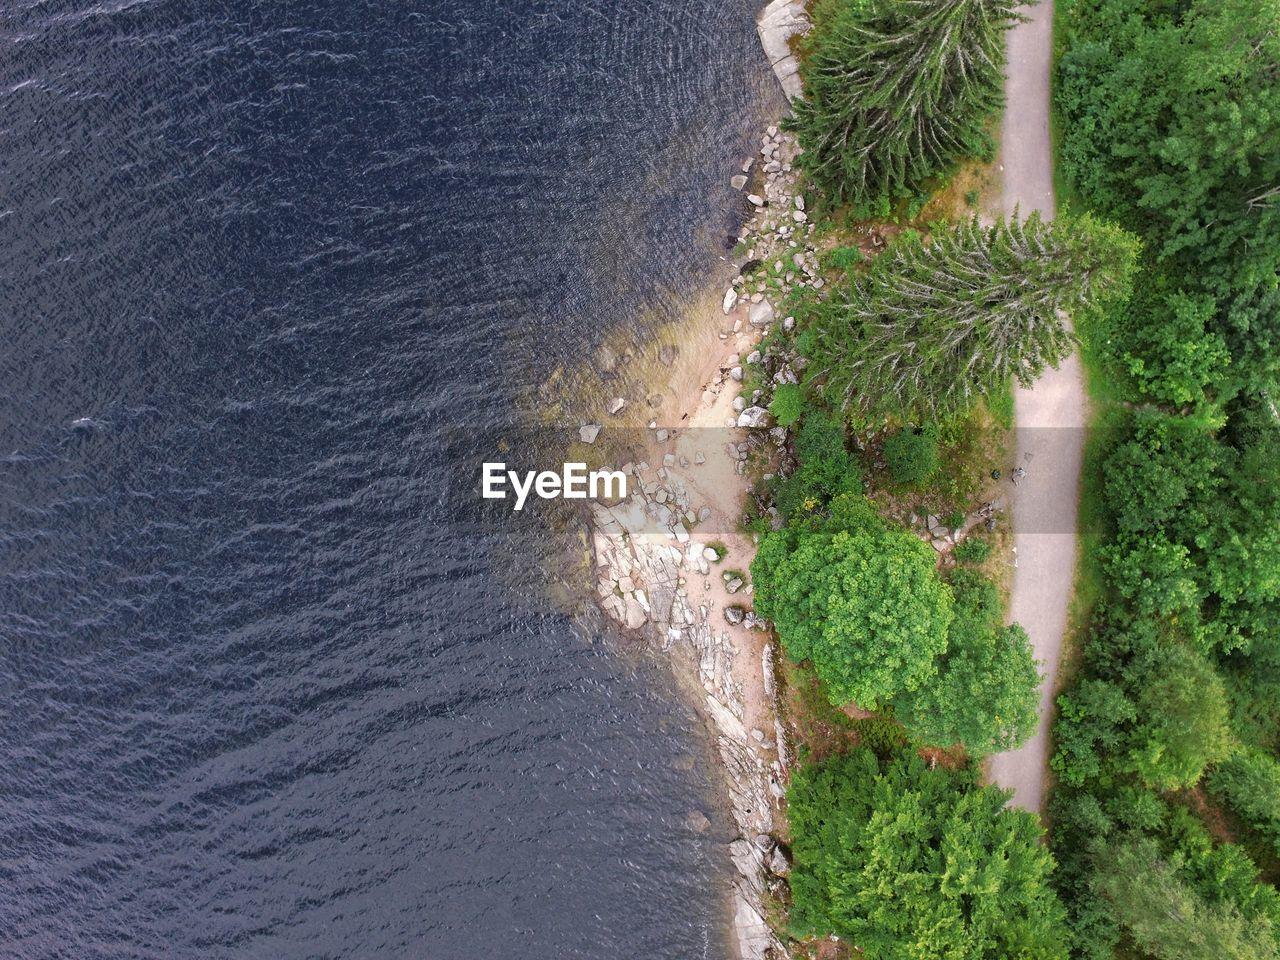 HIGH ANGLE VIEW OF TREES AND SEA